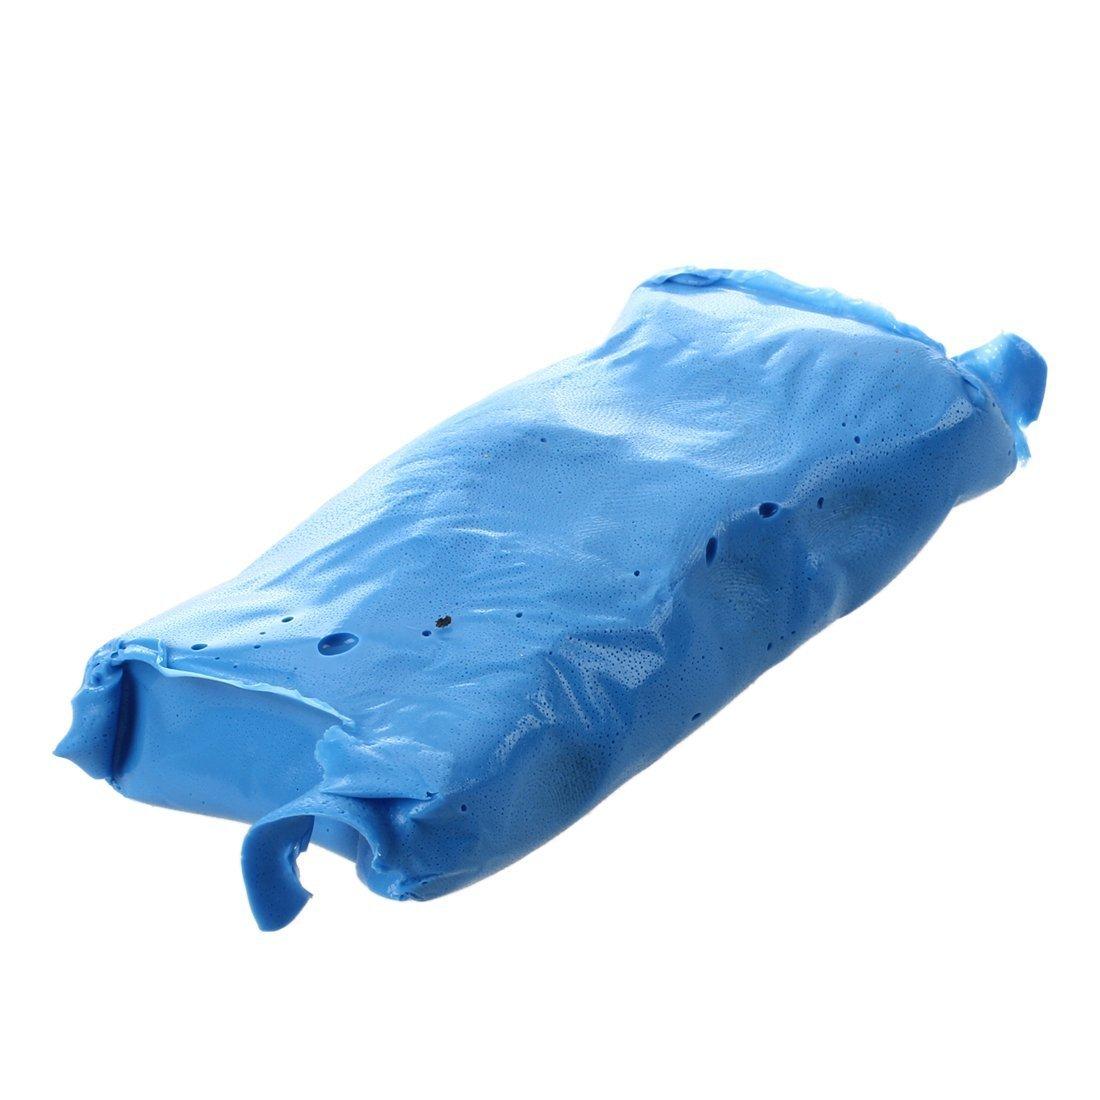 SODIAL(R) Argilla automobile Bar Manutenzione auto Magia Claybar Cleaner --- Blu LEPACA1134